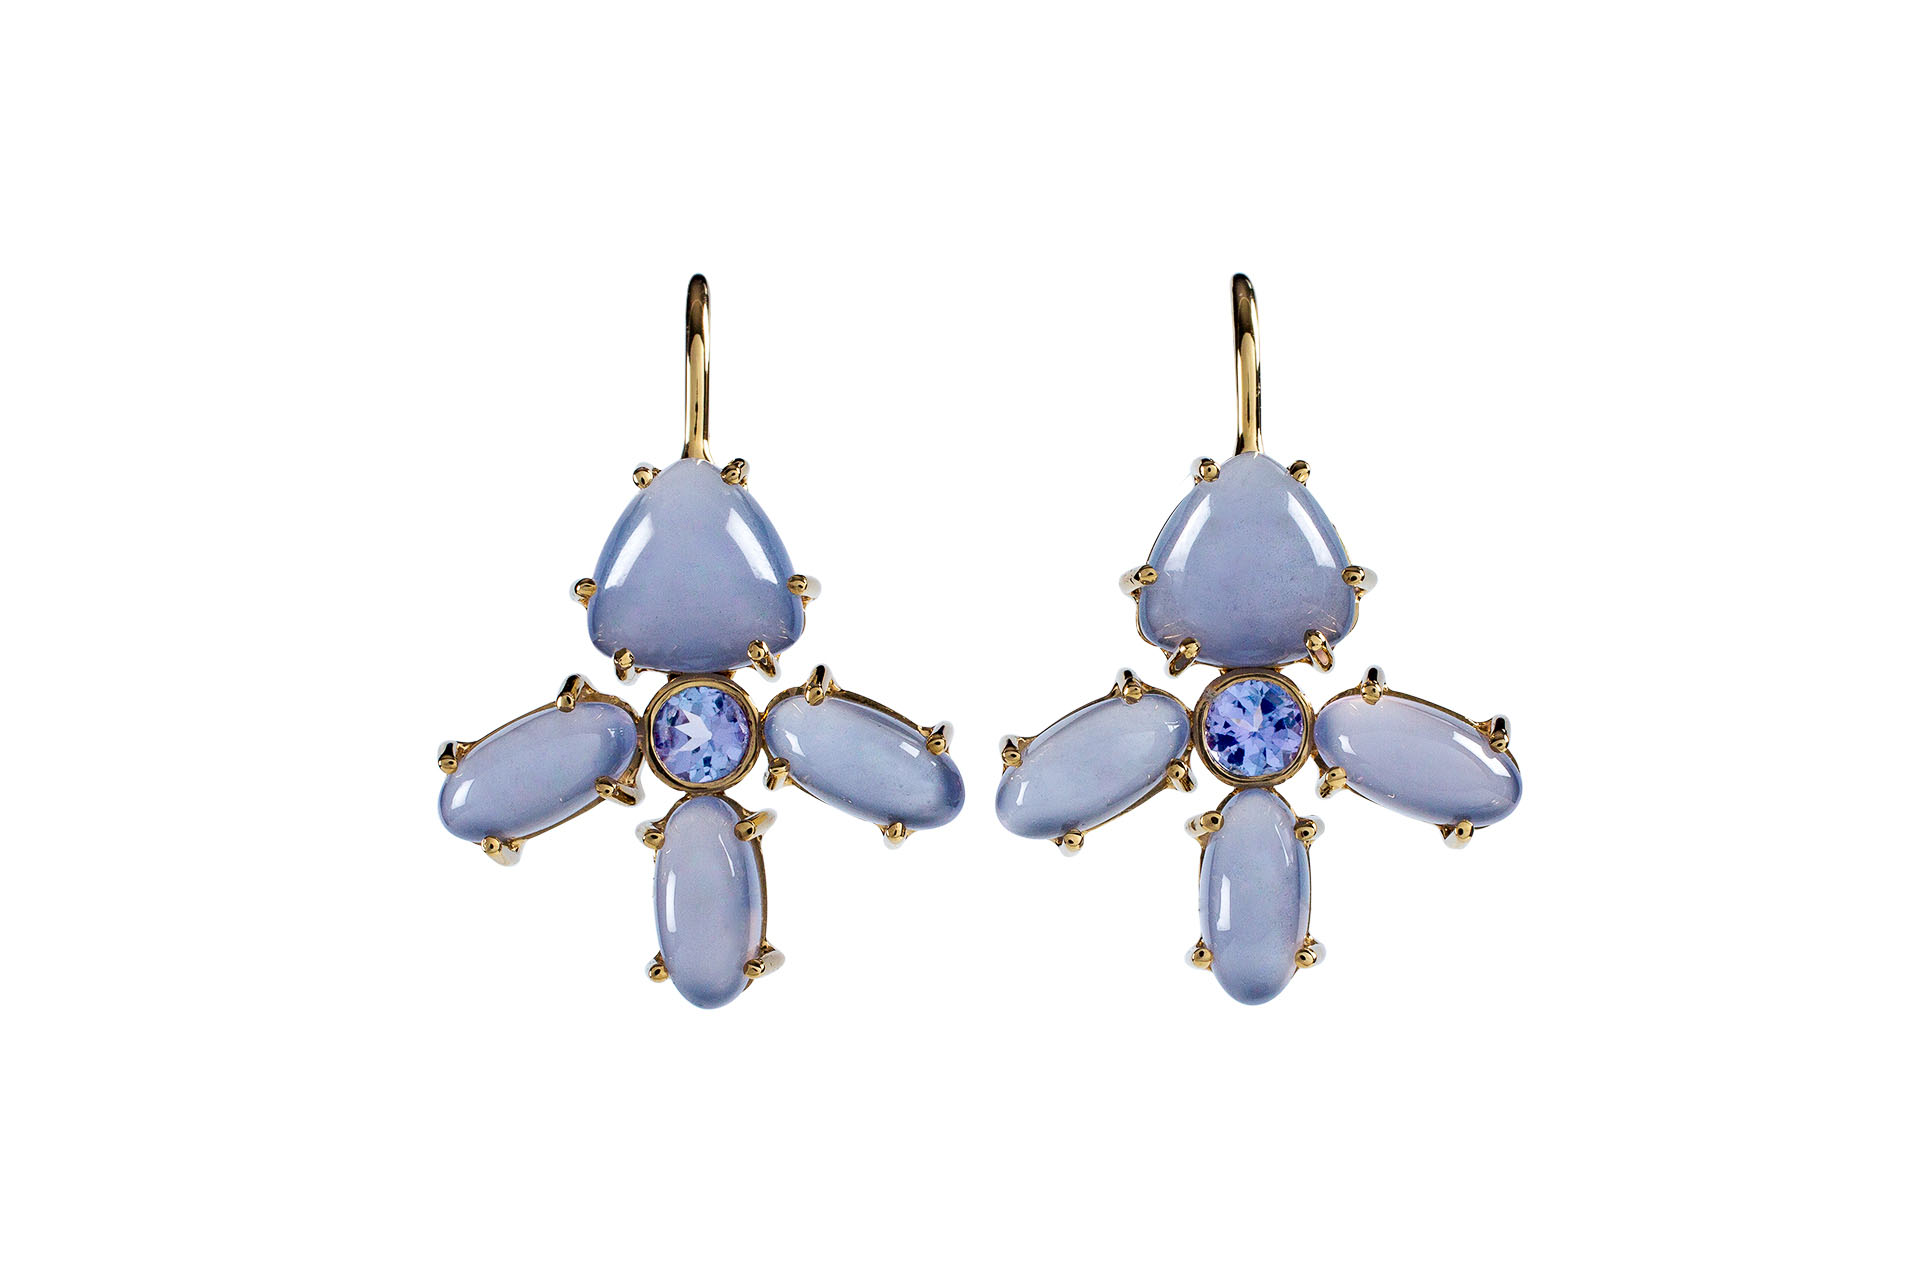 commercial-jewelry-photography-portfolio-004.jpg